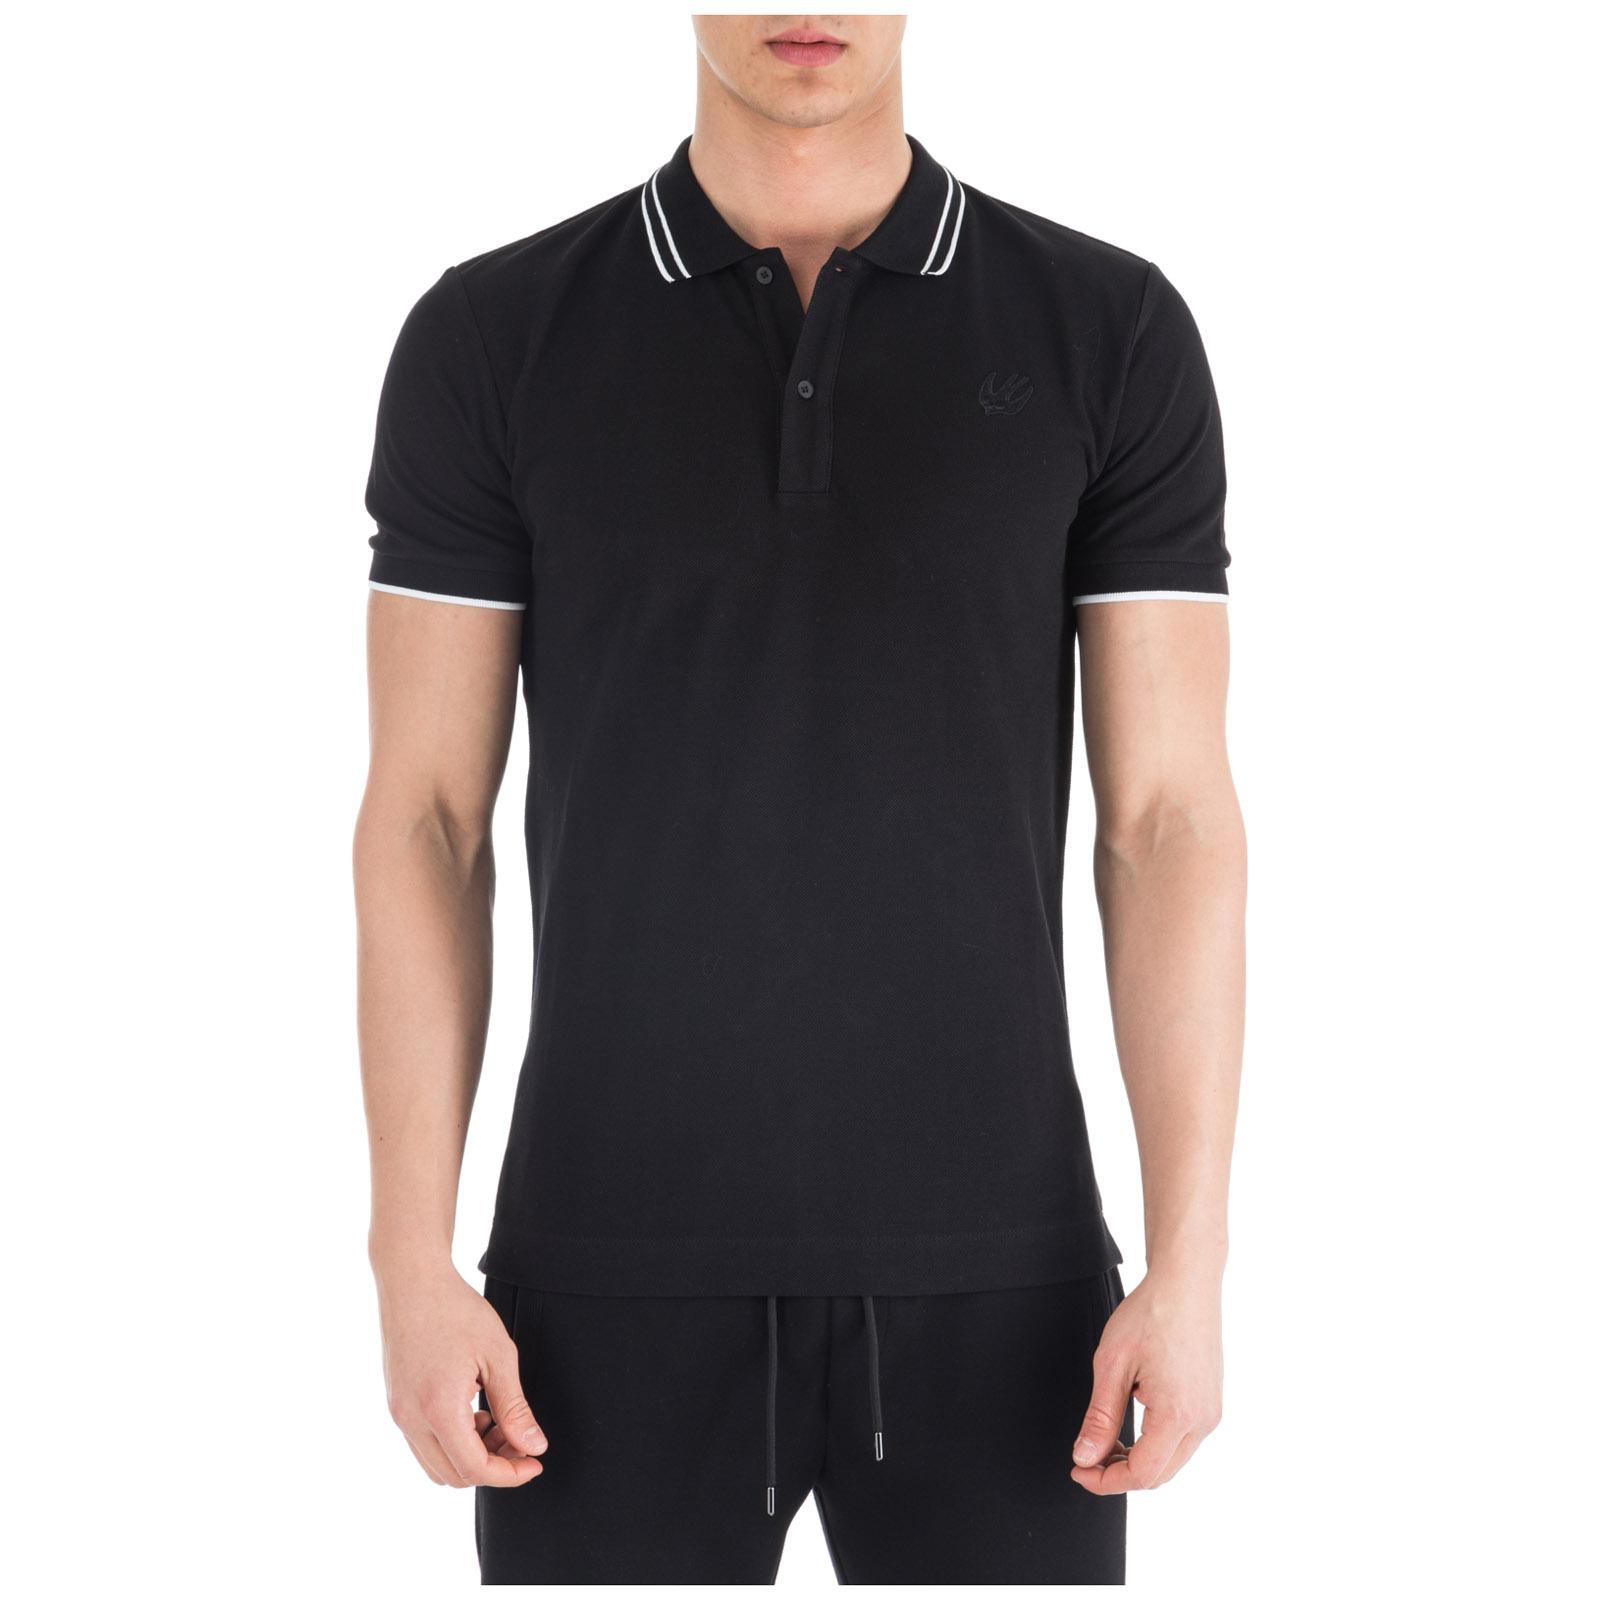 Men's short sleeve t-shirt polo collar swallow